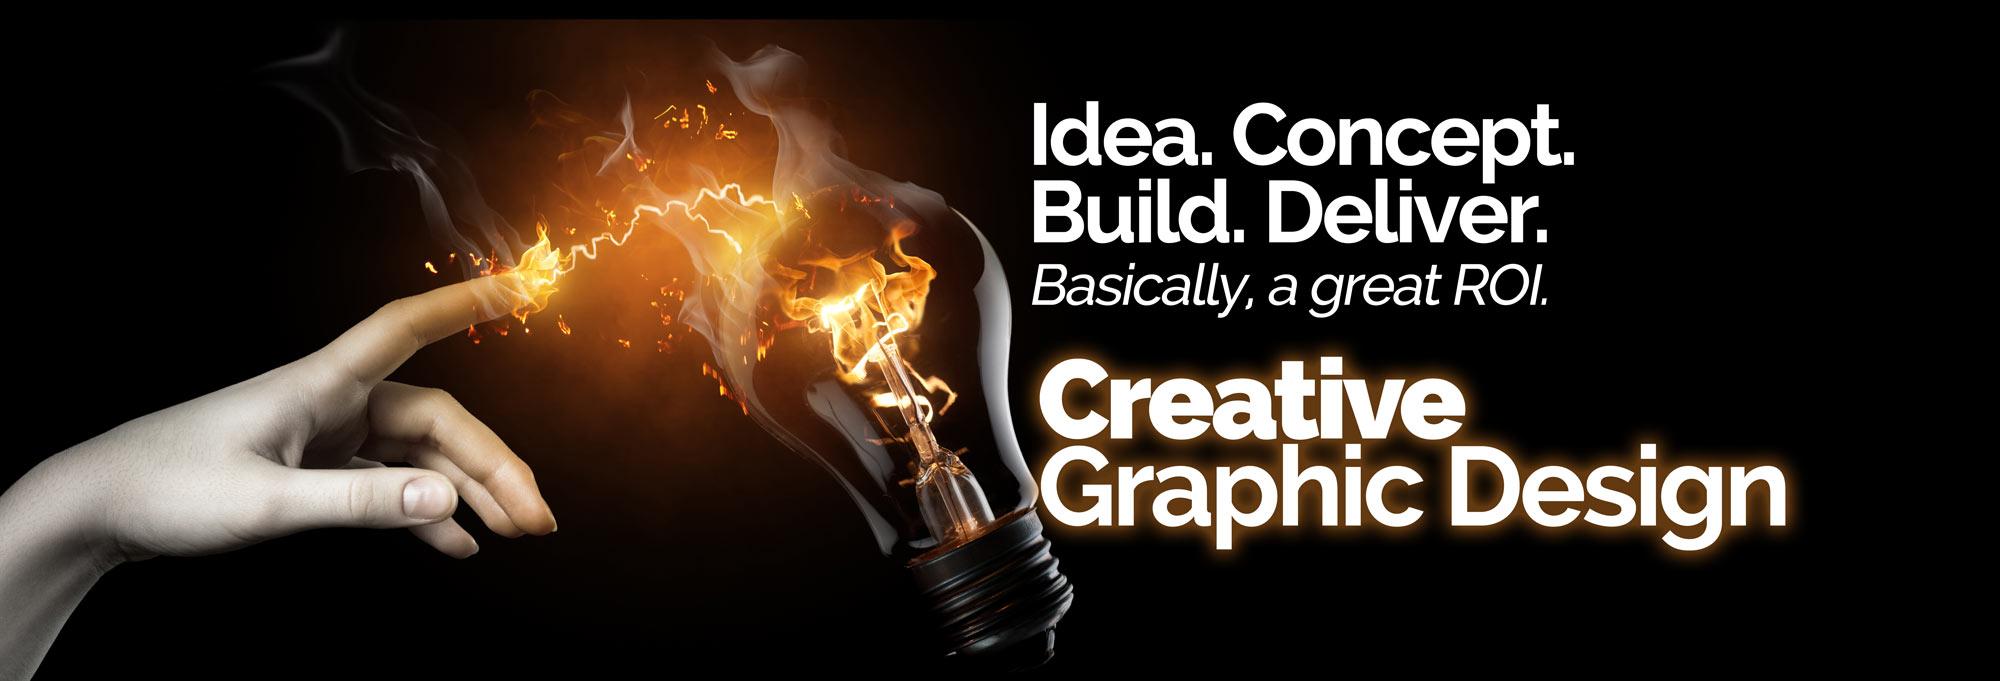 Stunning creative graphic design artwork